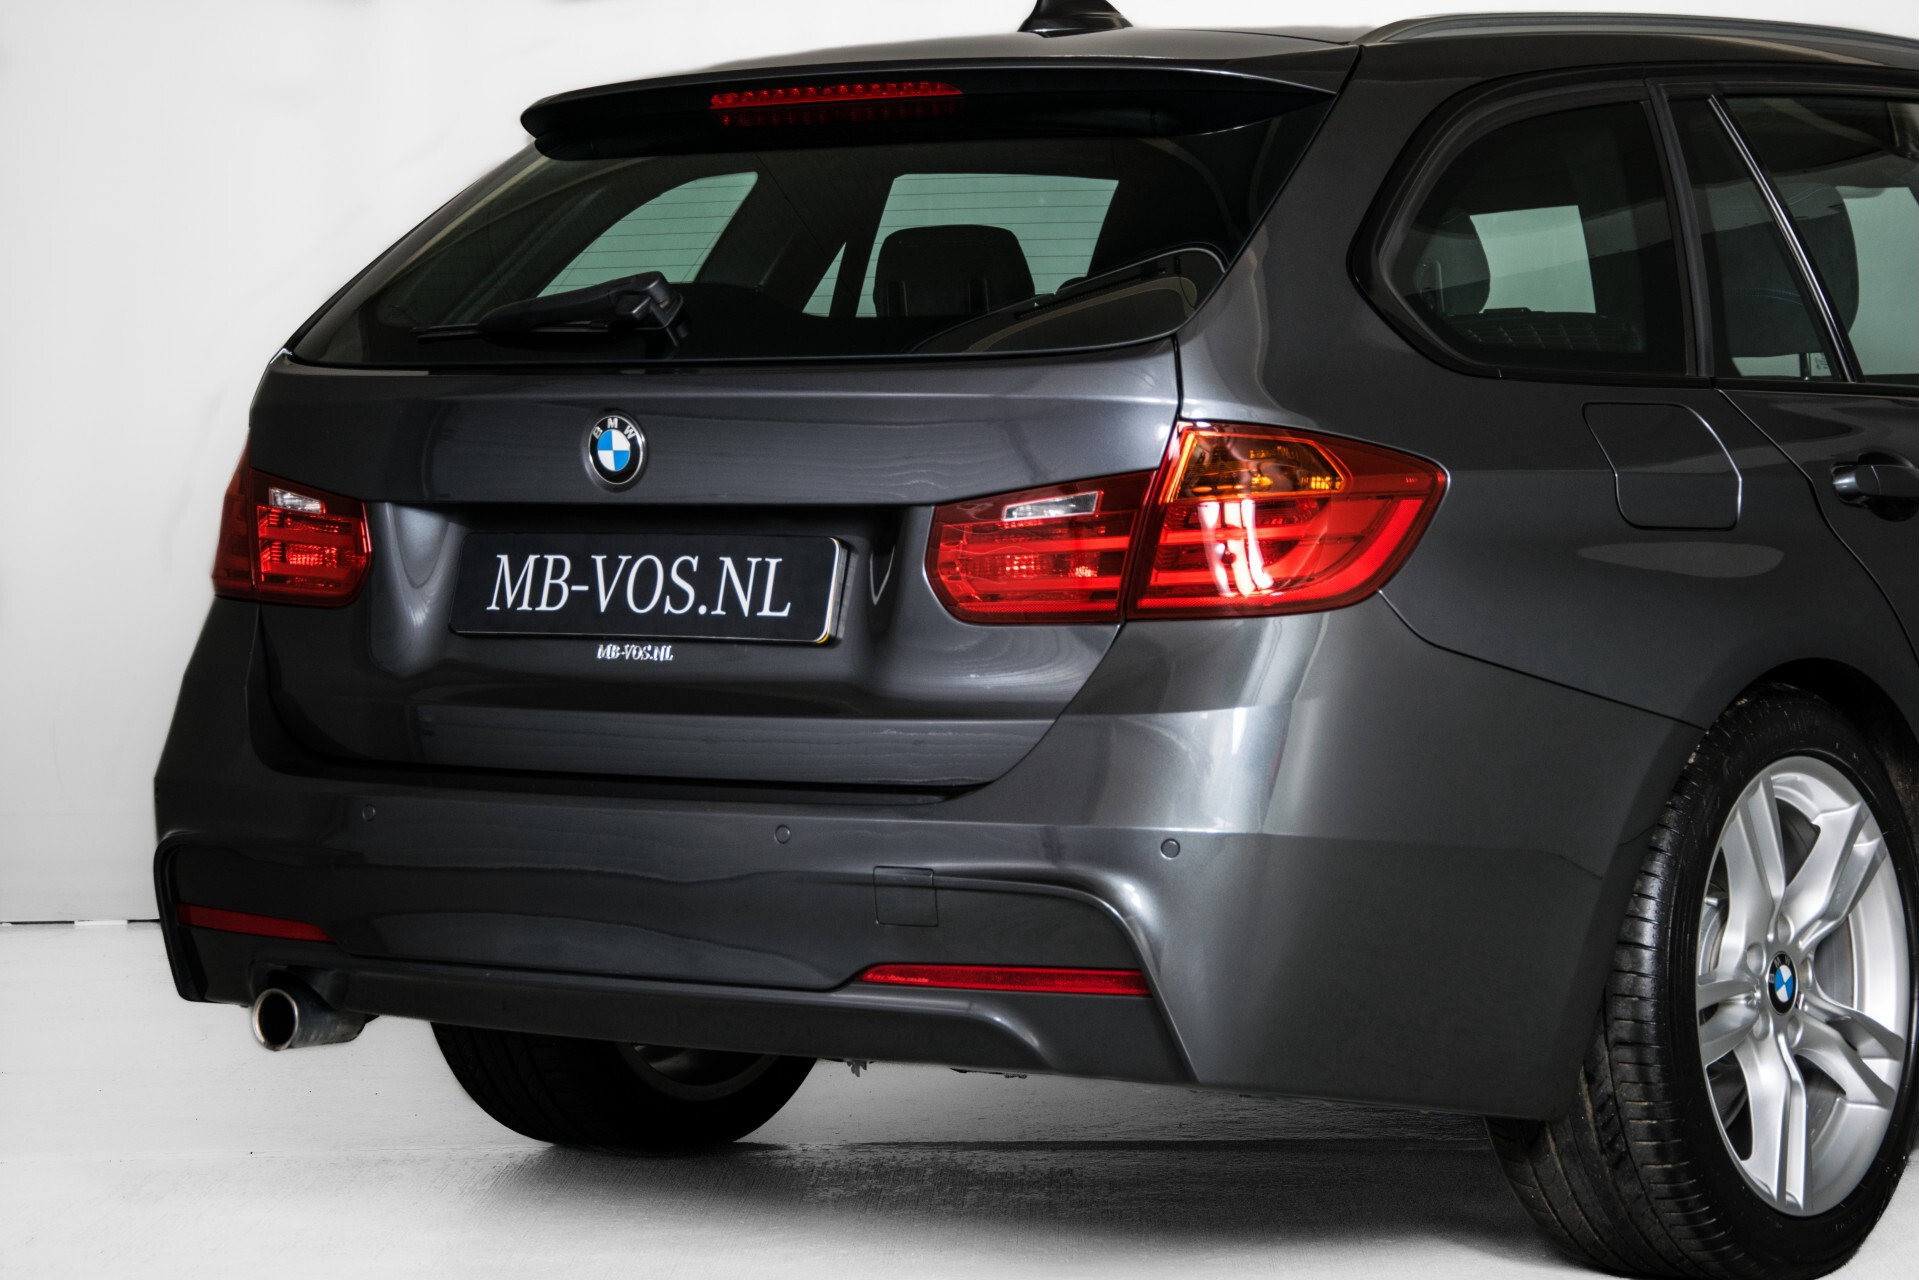 BMW 3 Serie Touring 316i M-Sportpakket Executive NL Auto/NAP Aut8 Foto 50